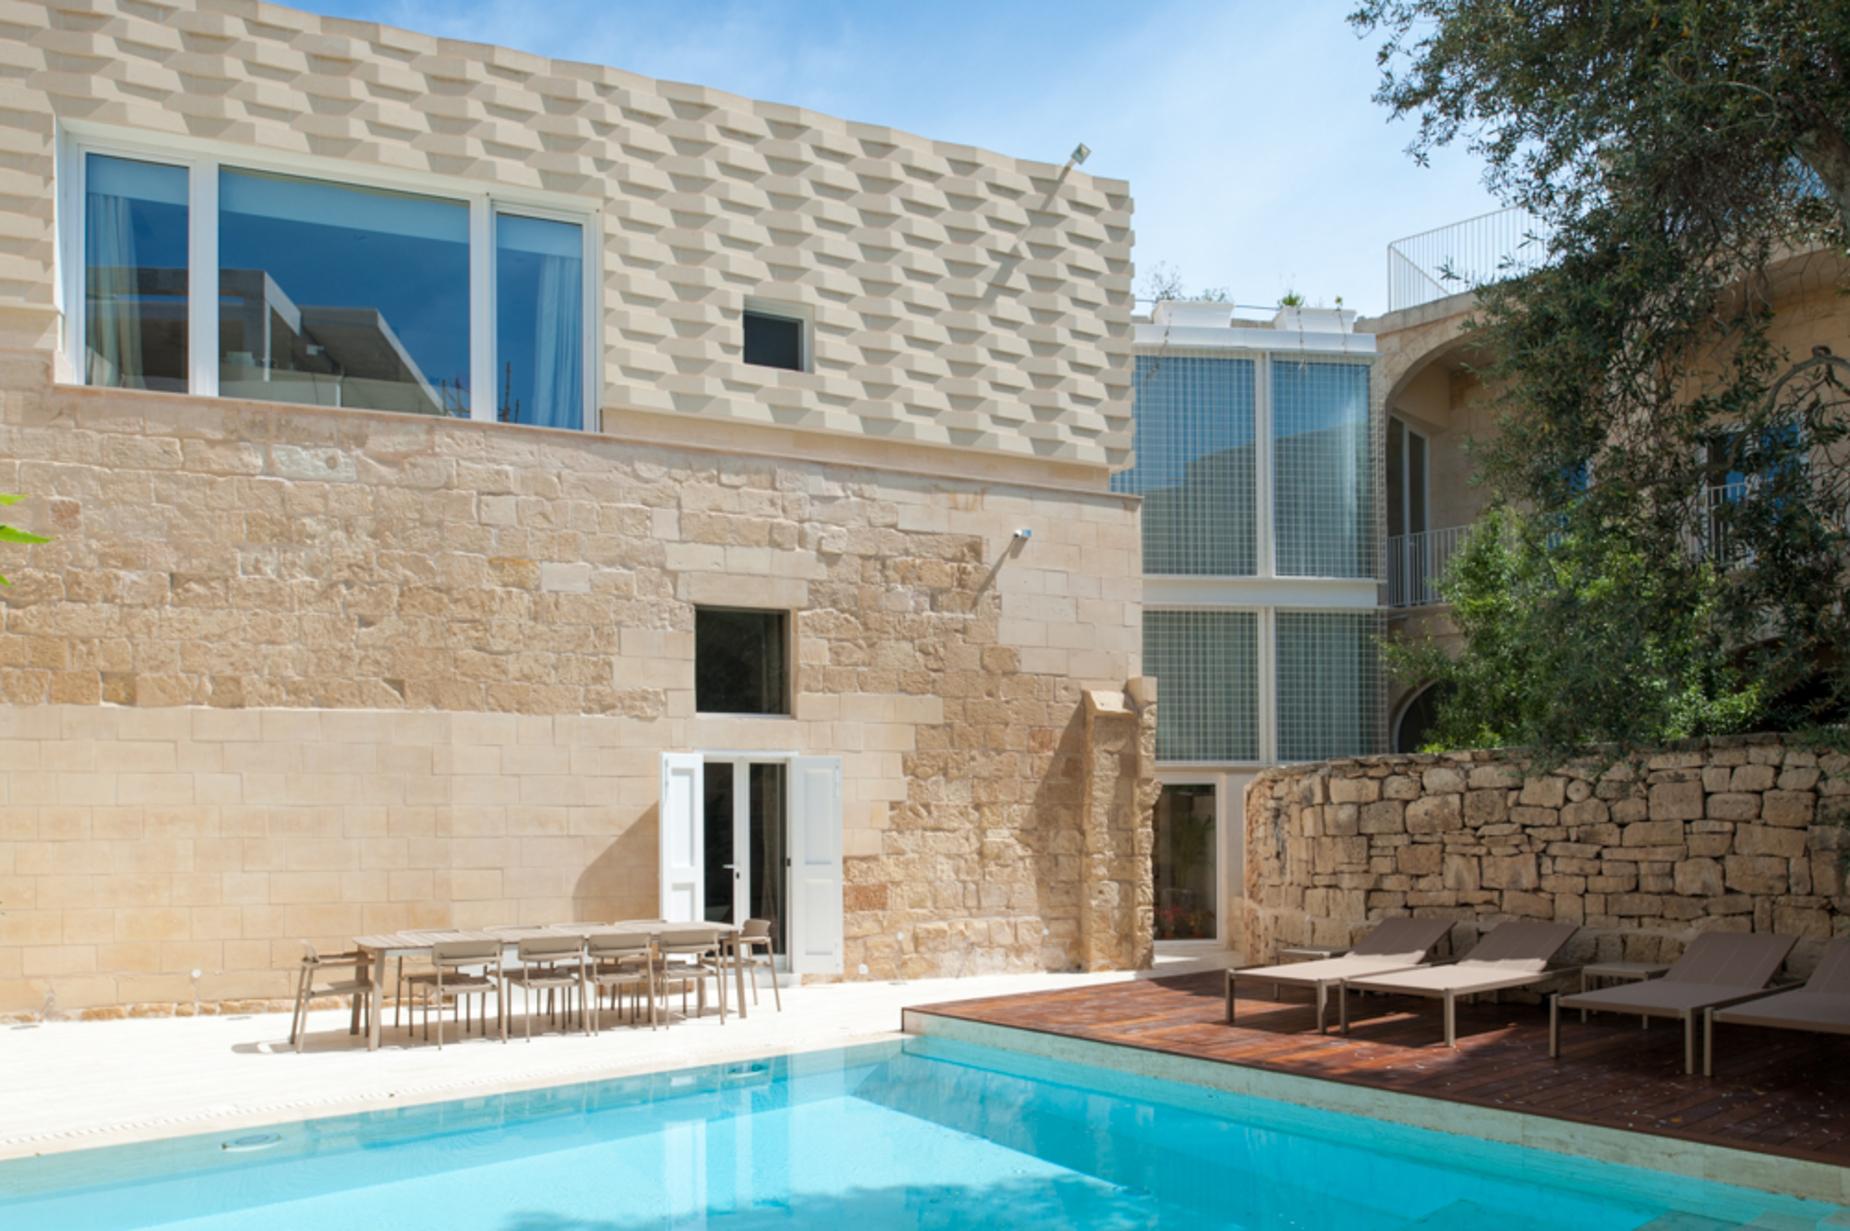 4 bed Town House For Sale in Balzan, Balzan - thumb 3